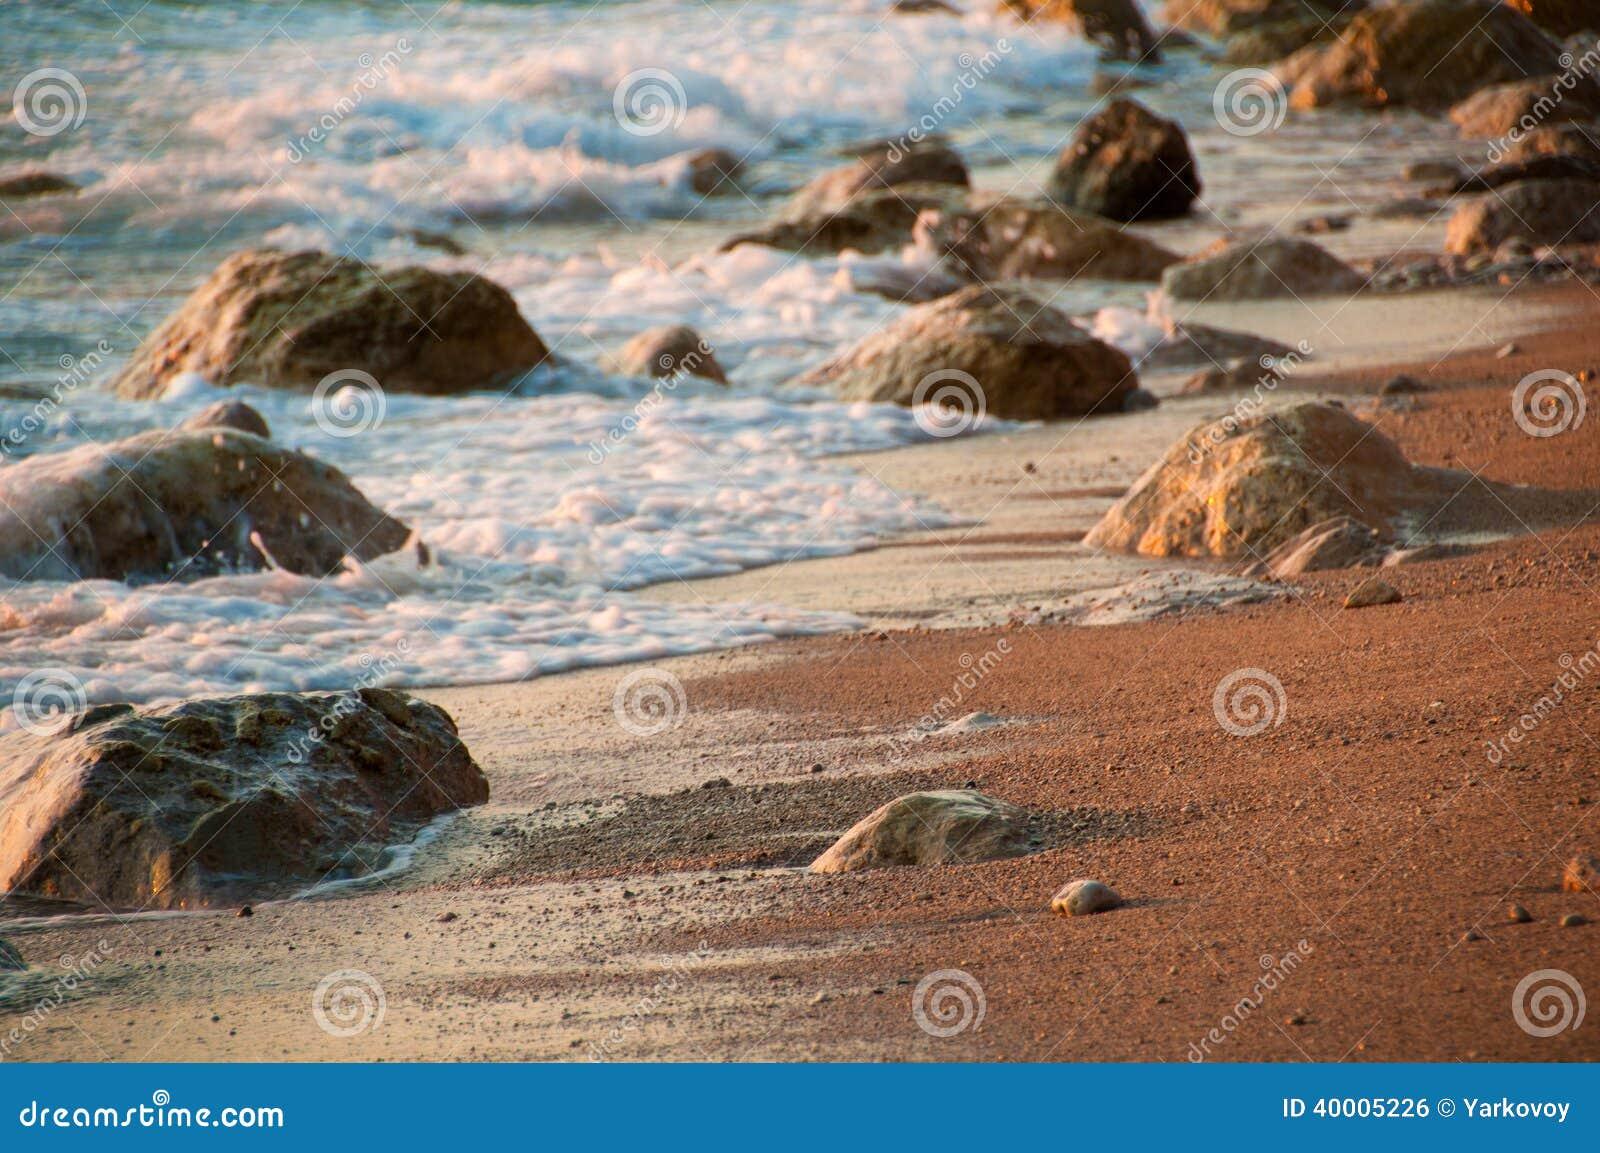 Romantic sunset at sea, waves